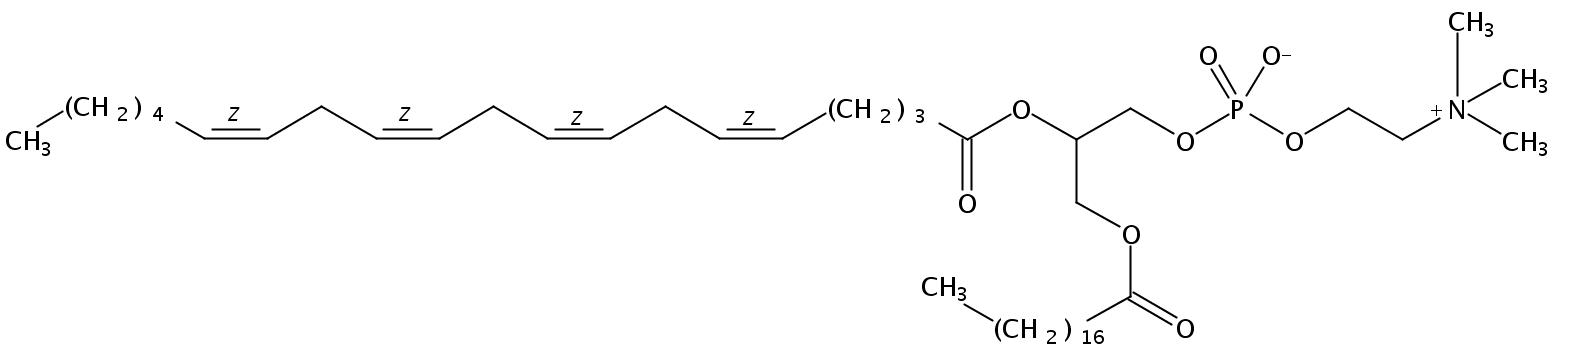 1-Stearoyl-2-Arachidonoyl-sn-Glycero-3-Phosphatidylcholine